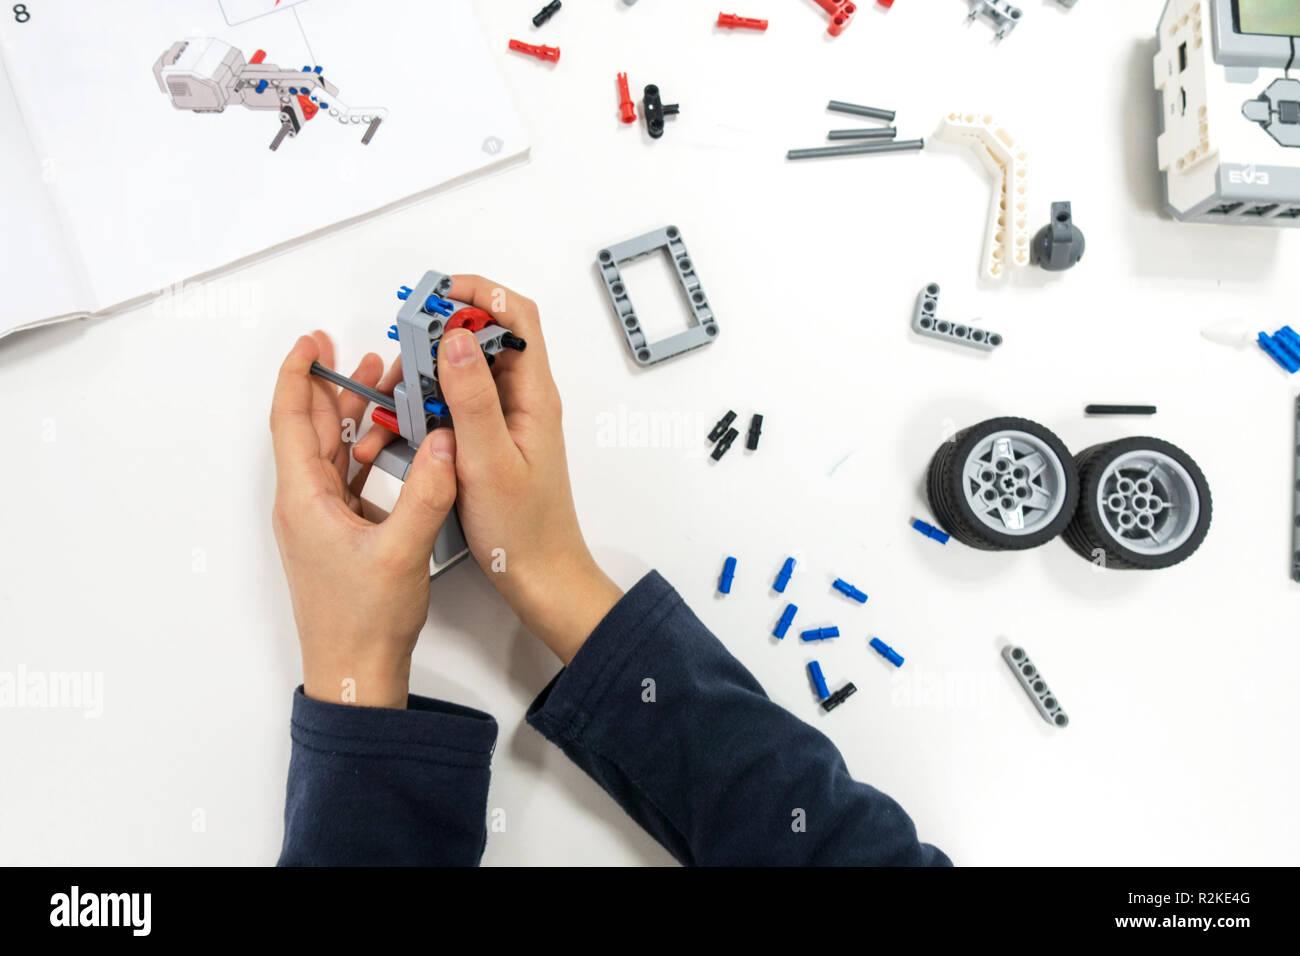 Lego Education Stock Photos Images Alamy Electronic Ear For Rcx Module Vilnius Lithuania November 16 2018 Kid Making Robot Mindstorms Robotic